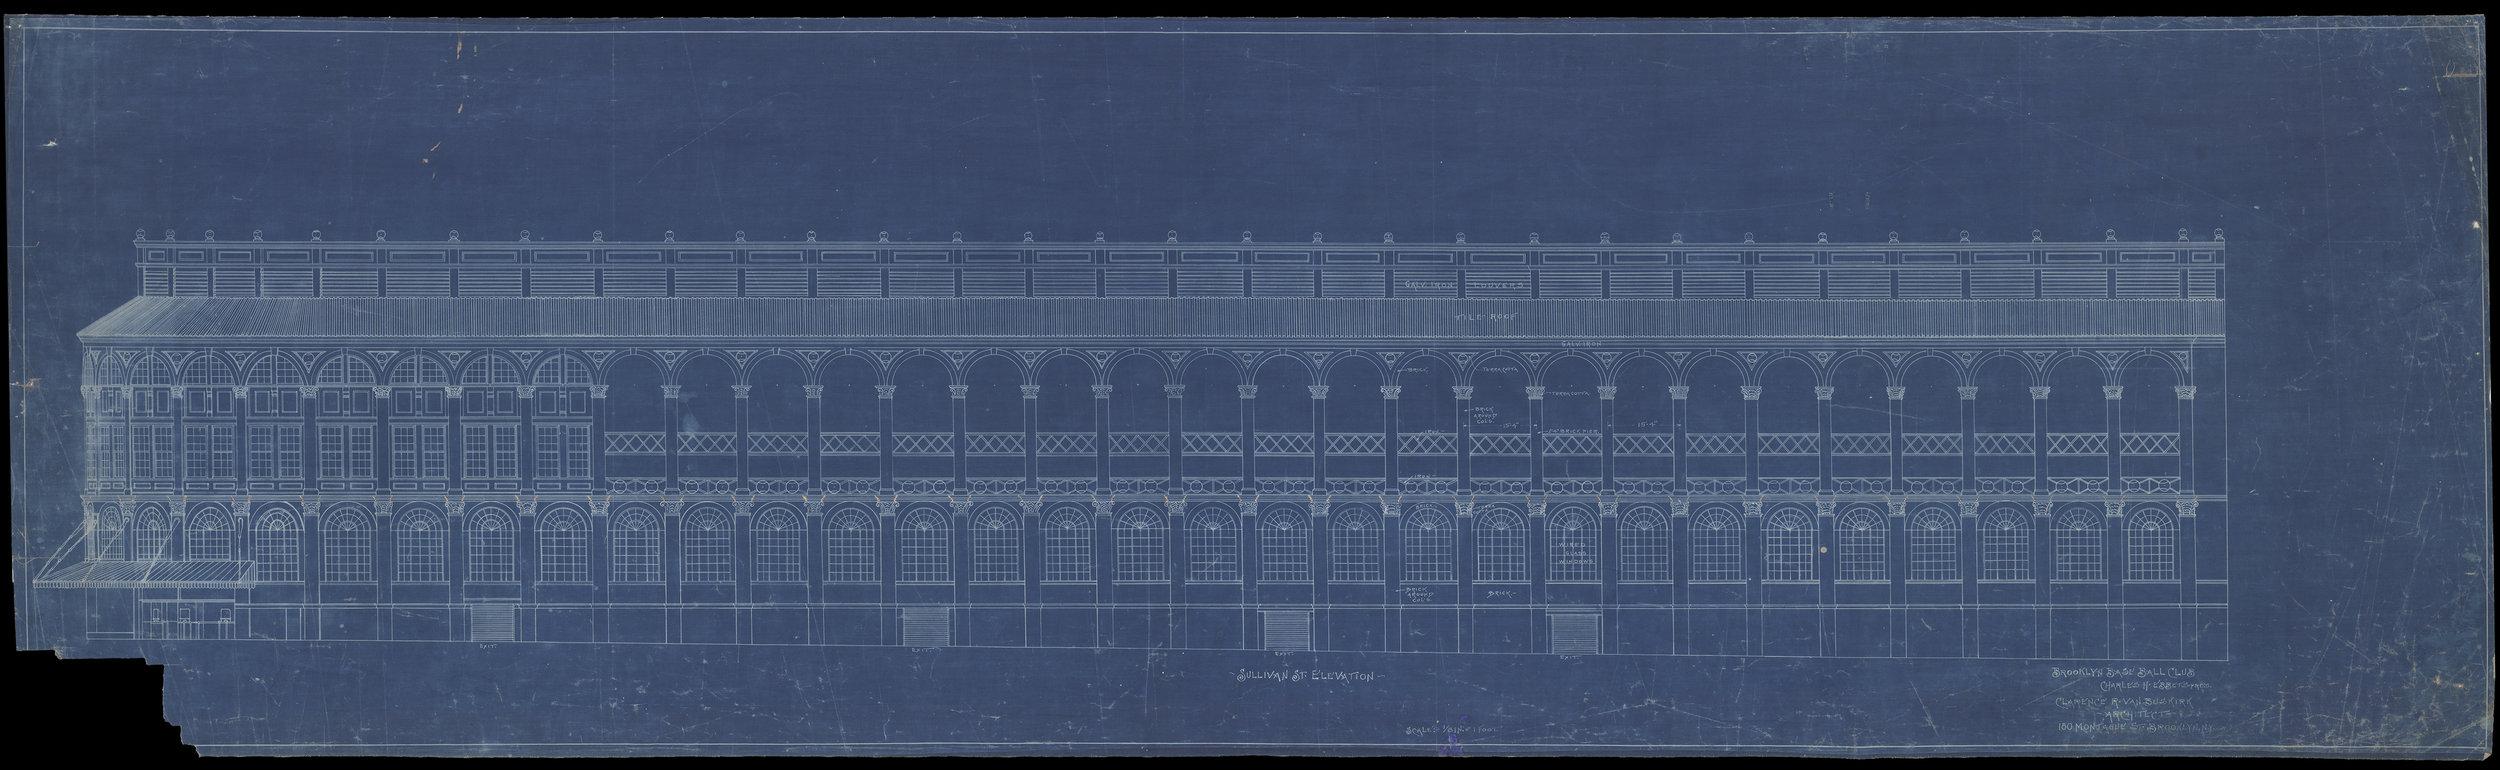 Sullivan Street Elevation, Brooklyn Base Ball Club [Ebbets Field], Clarence R. Van Buskirk, 1912.